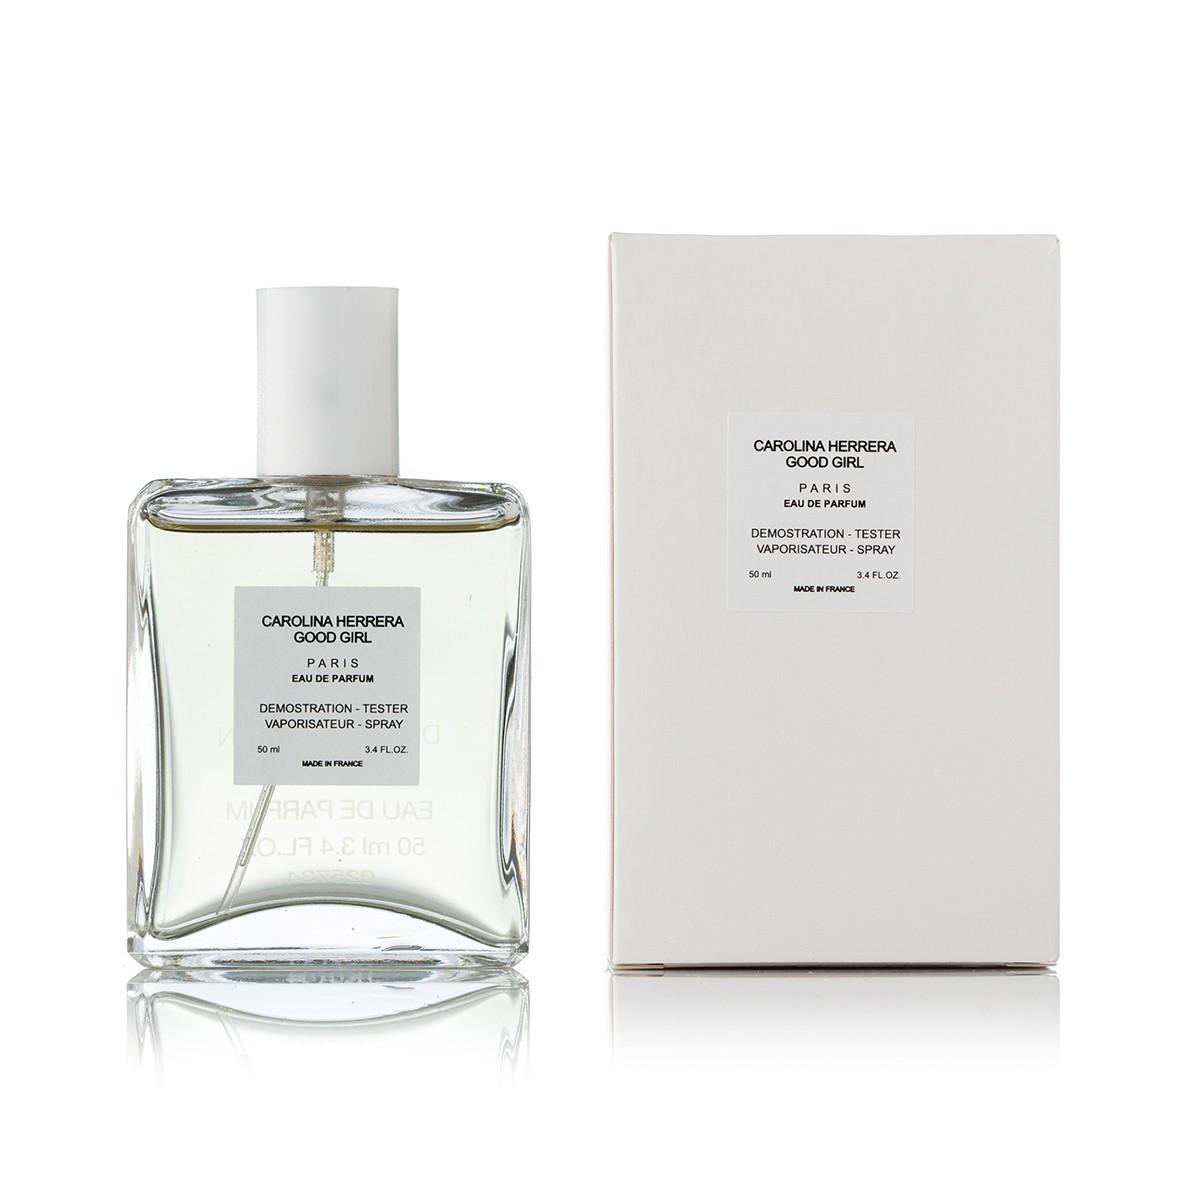 50мл мини-парфюм тестер Carolina Herrera Good Girl (Ж)  продажа ... 4316403a05c